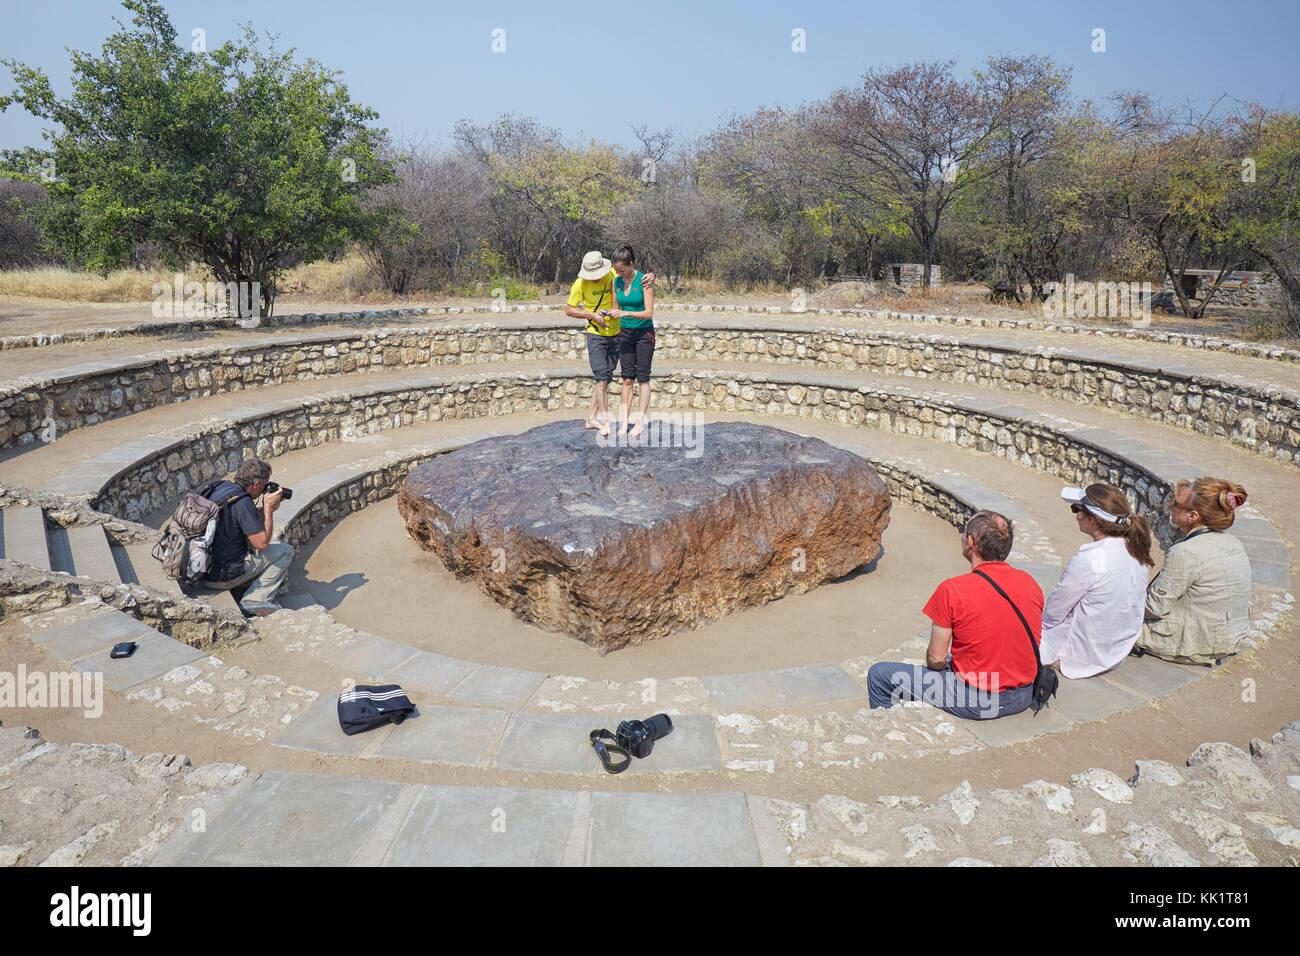 Tourists at Hoba meteorite near Grootfontein, Namibia, Africa - Stock Image